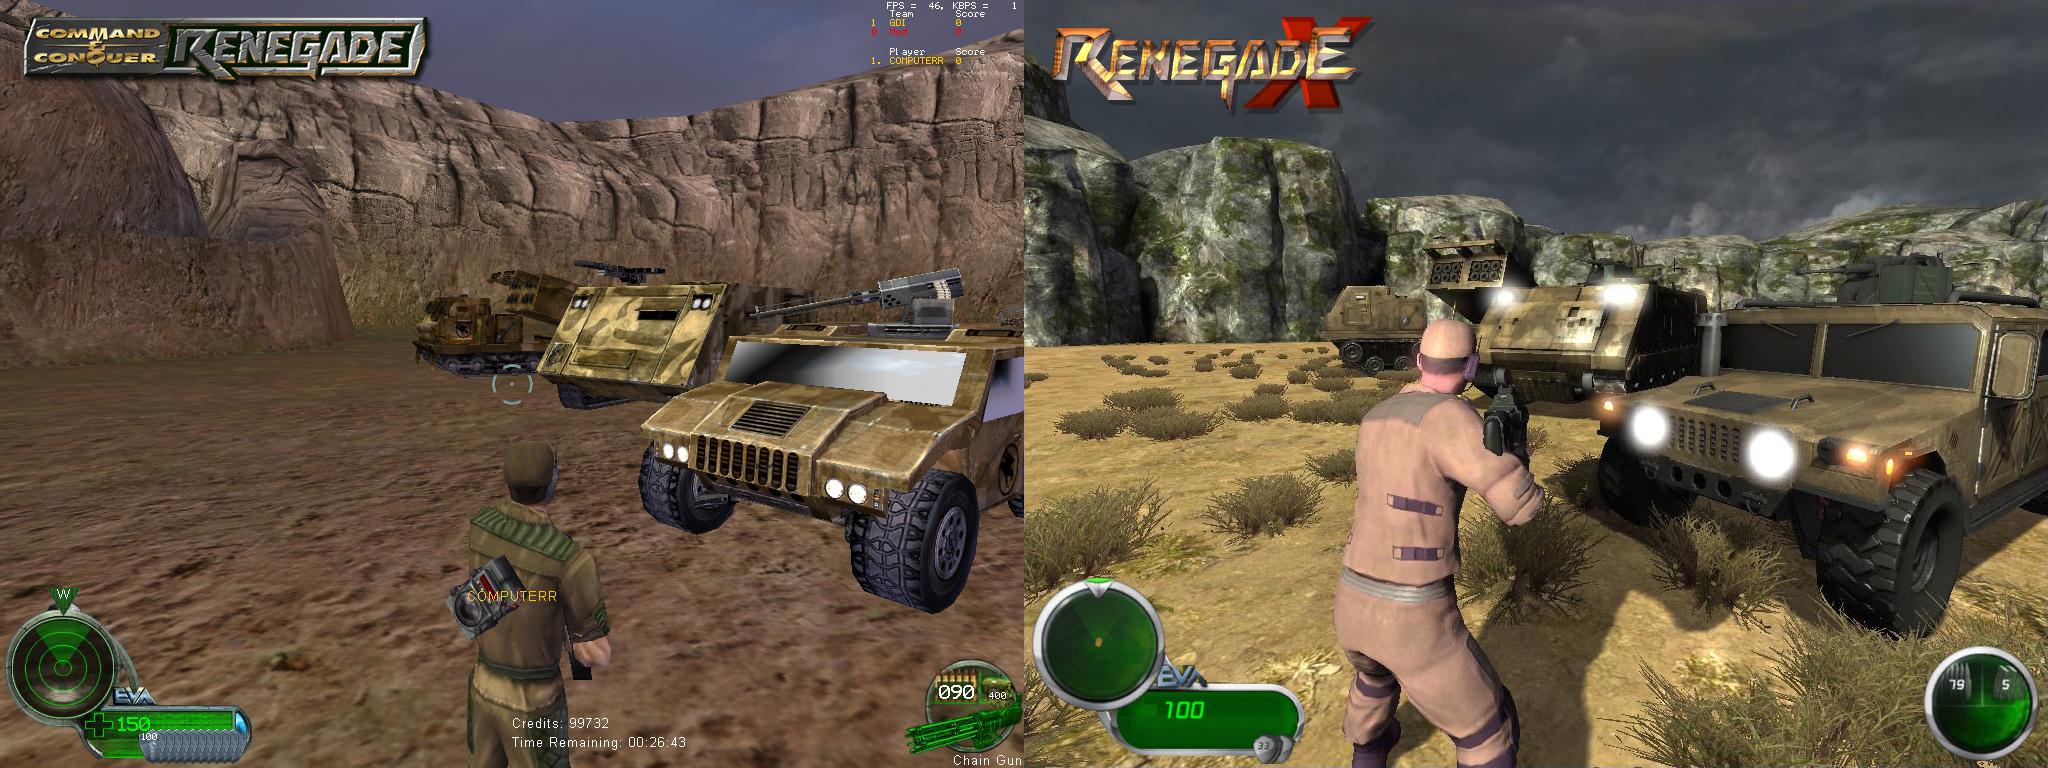 The mastodon unit image - kanes wrath reloaded mod for cc3: tiberium wars